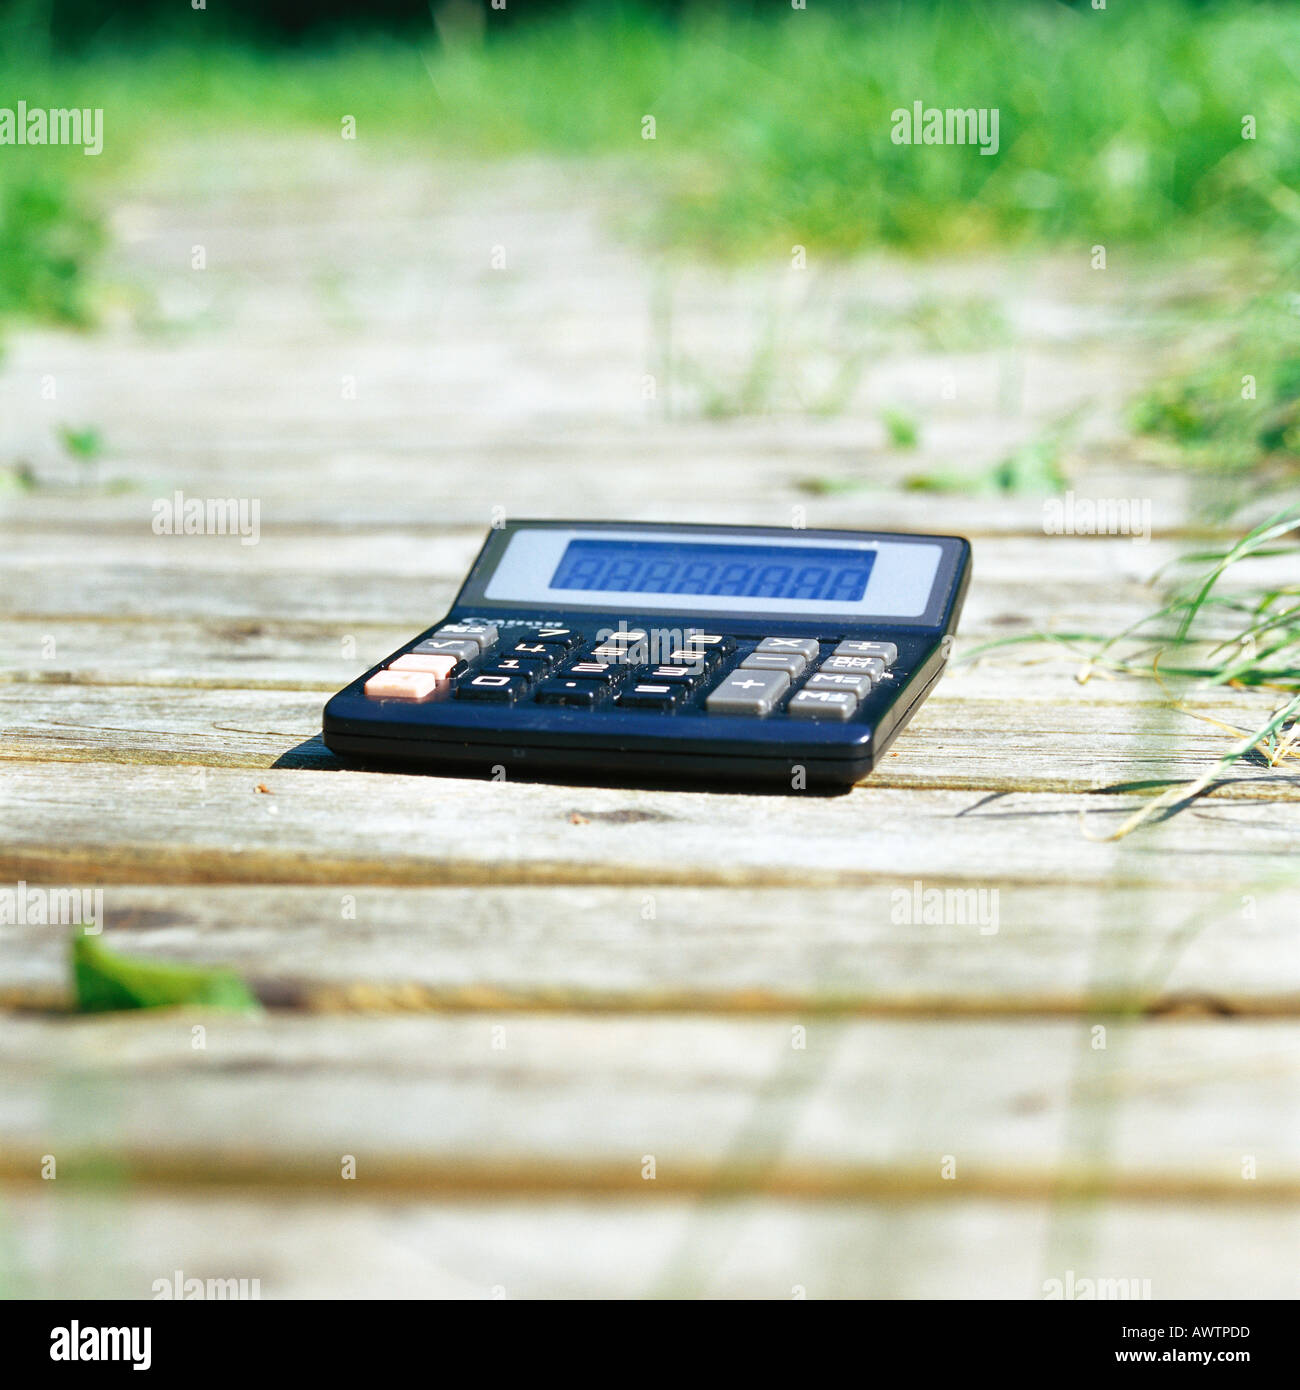 Calculator on path - Stock Image